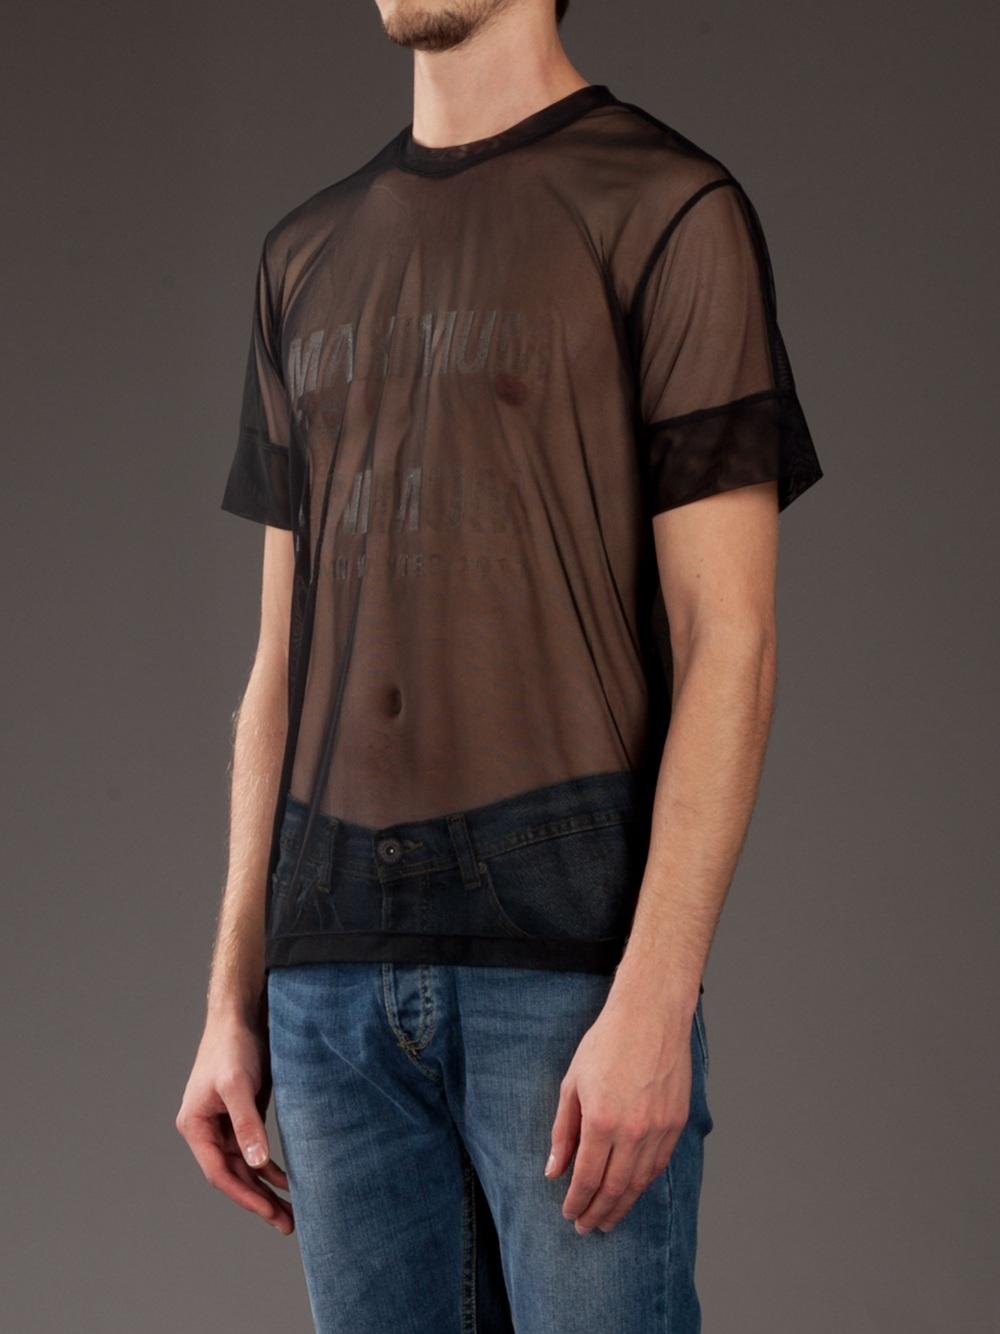 d4b9de2f2 Sexy Dominik Mens Round Collar Sleeveless Mesh Shirt MHB2196 Black